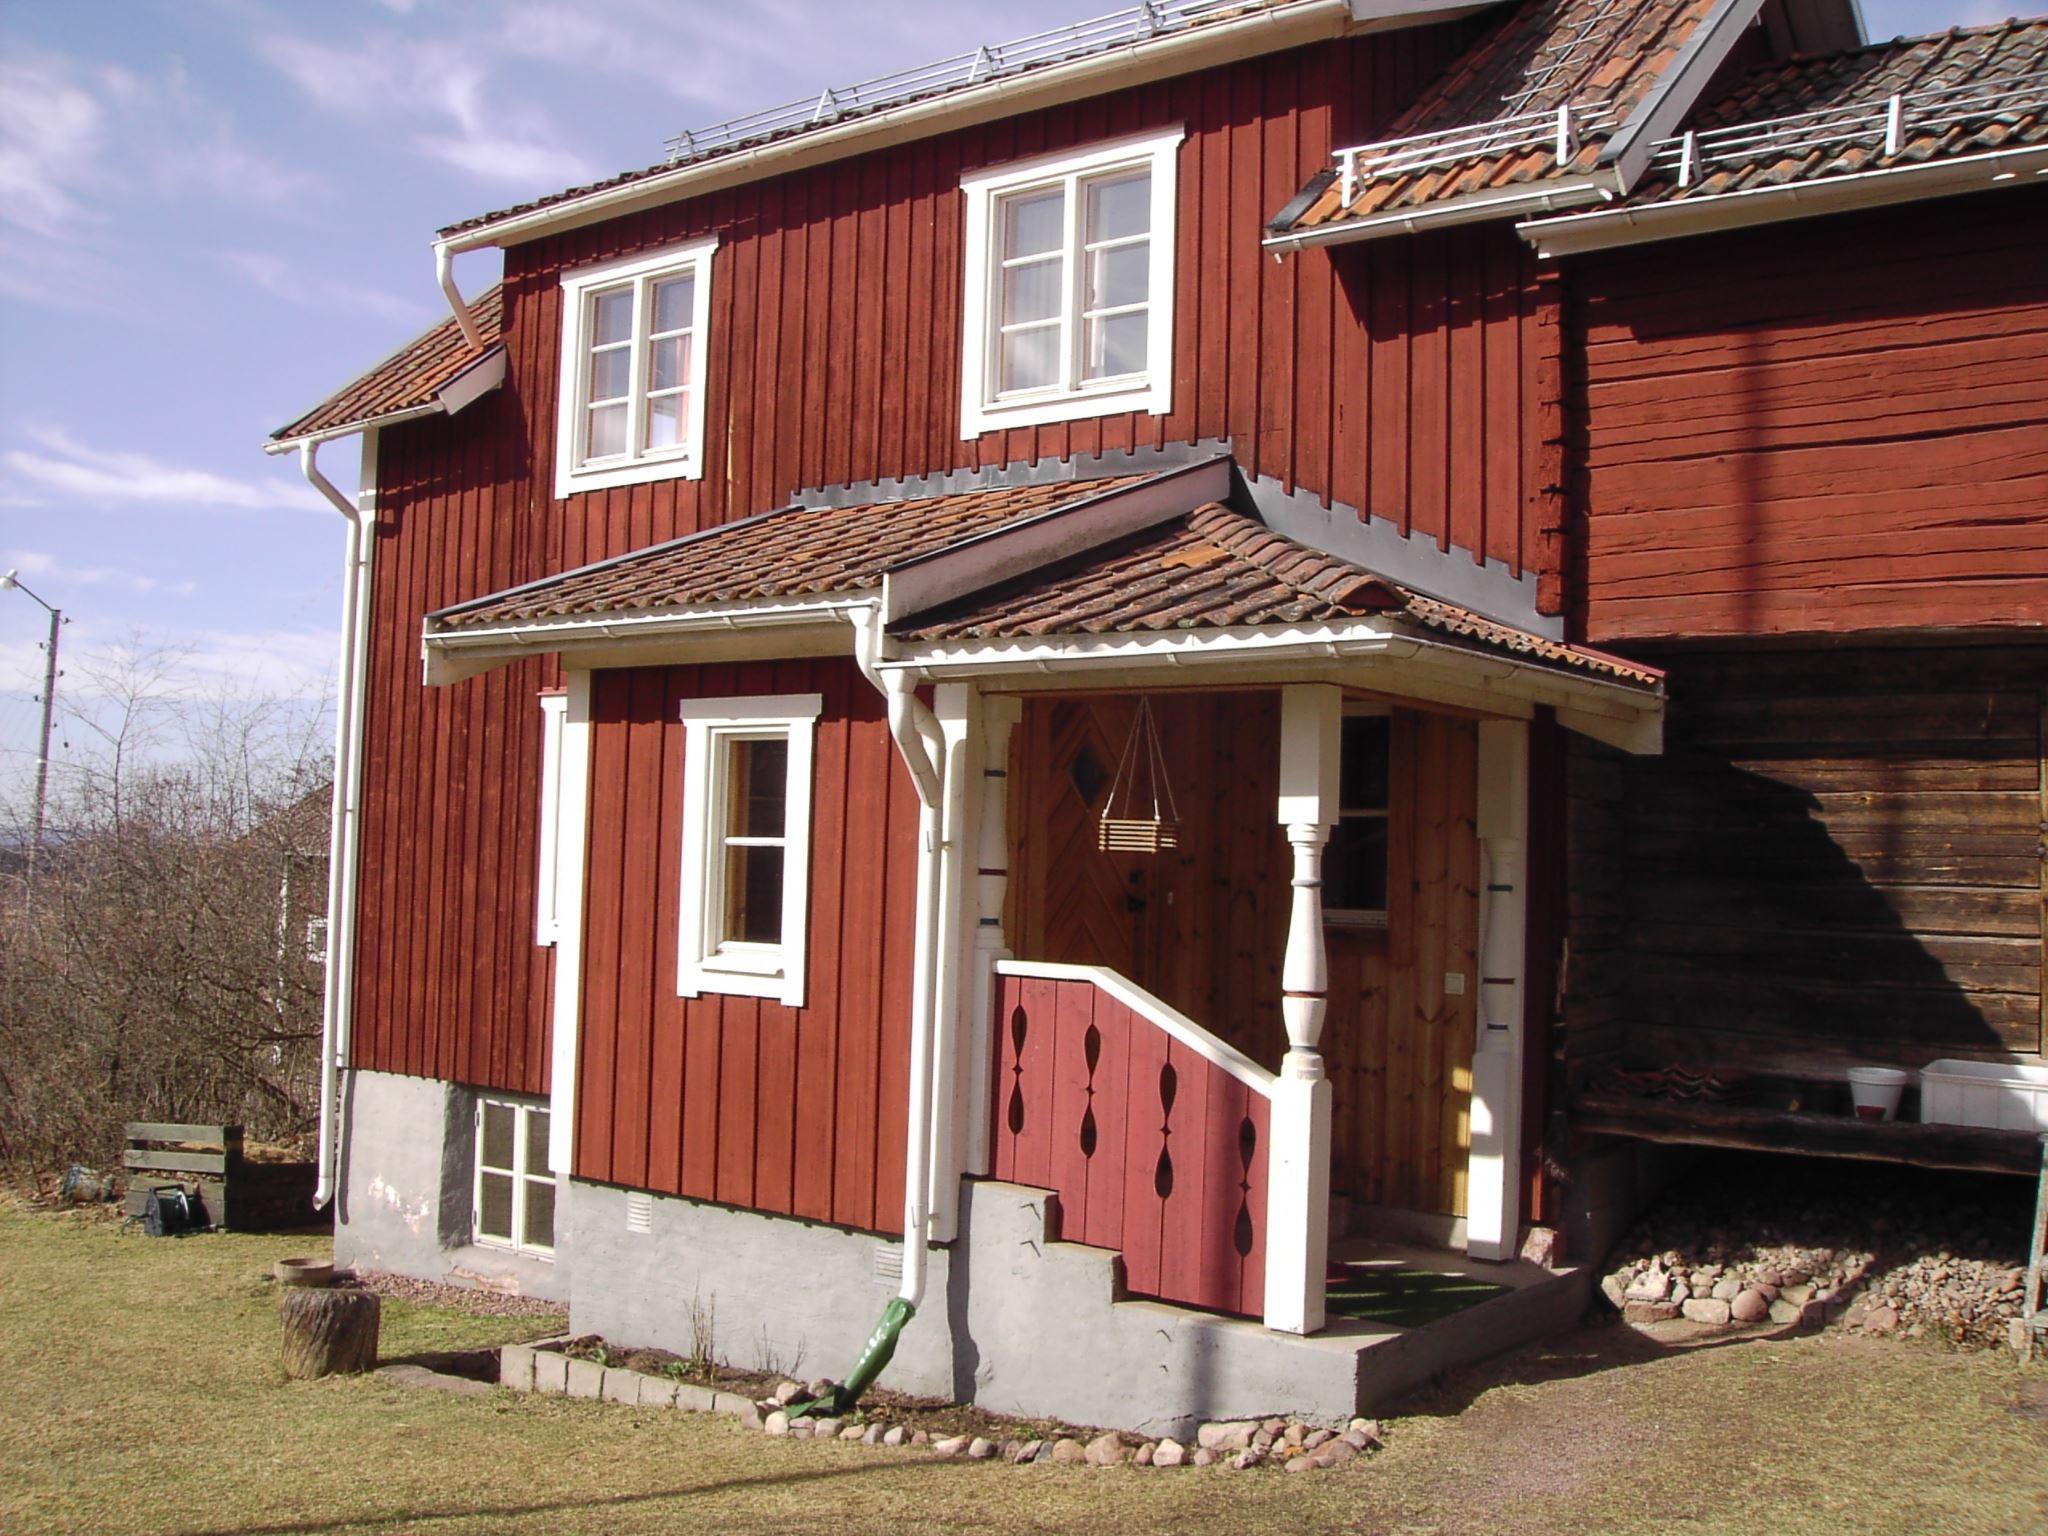 R305 Vikarbyn, Rättvik